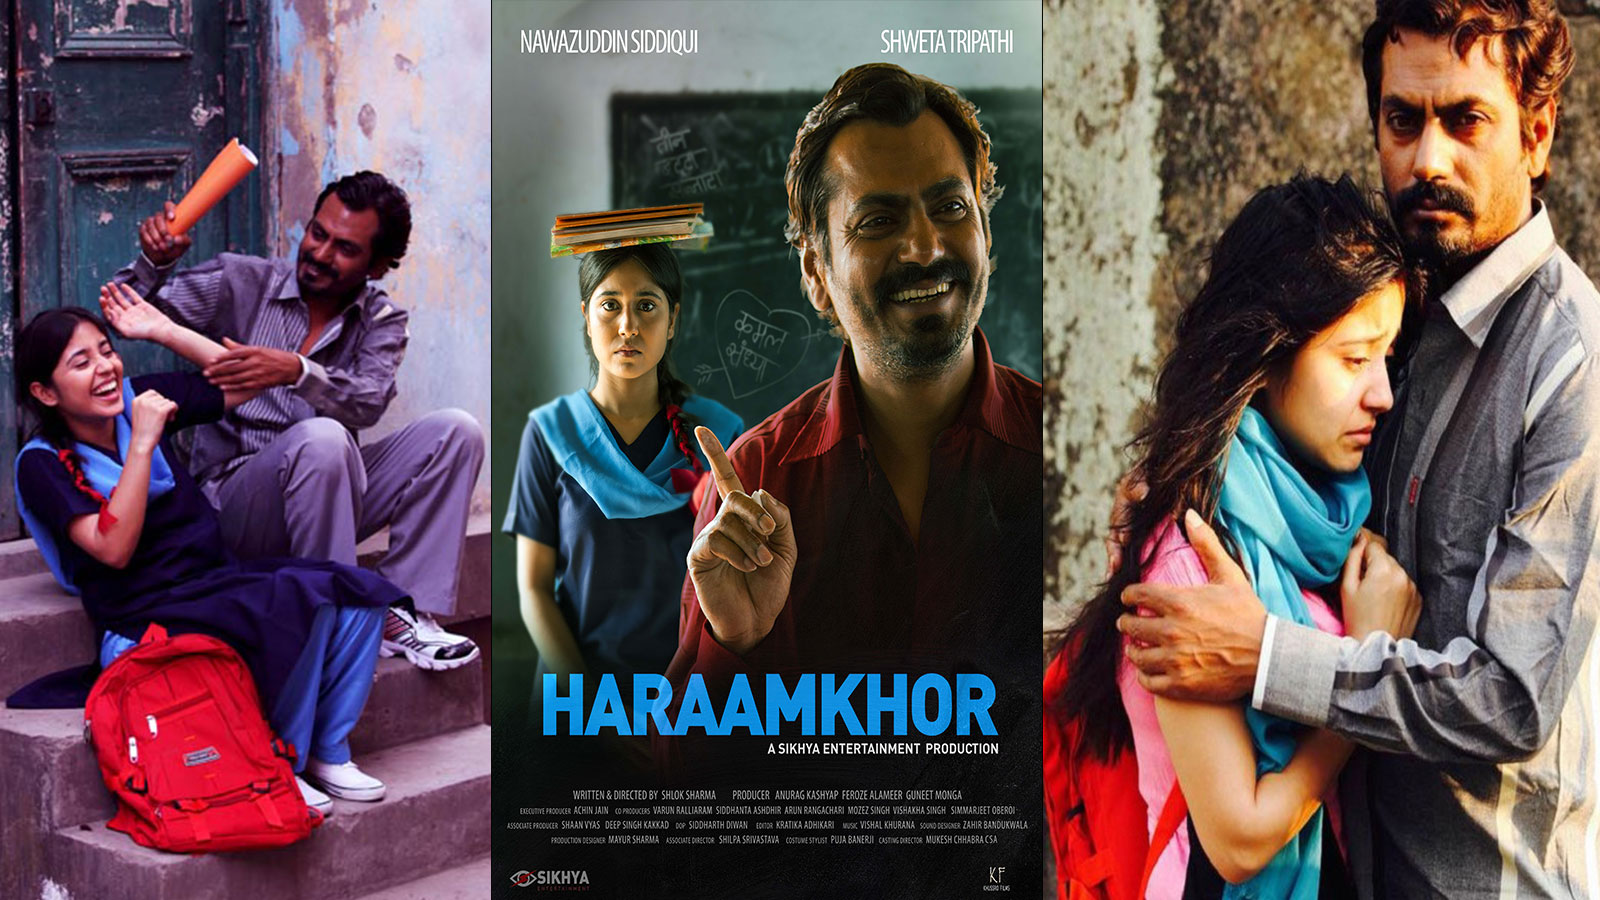 haramkhor-poster